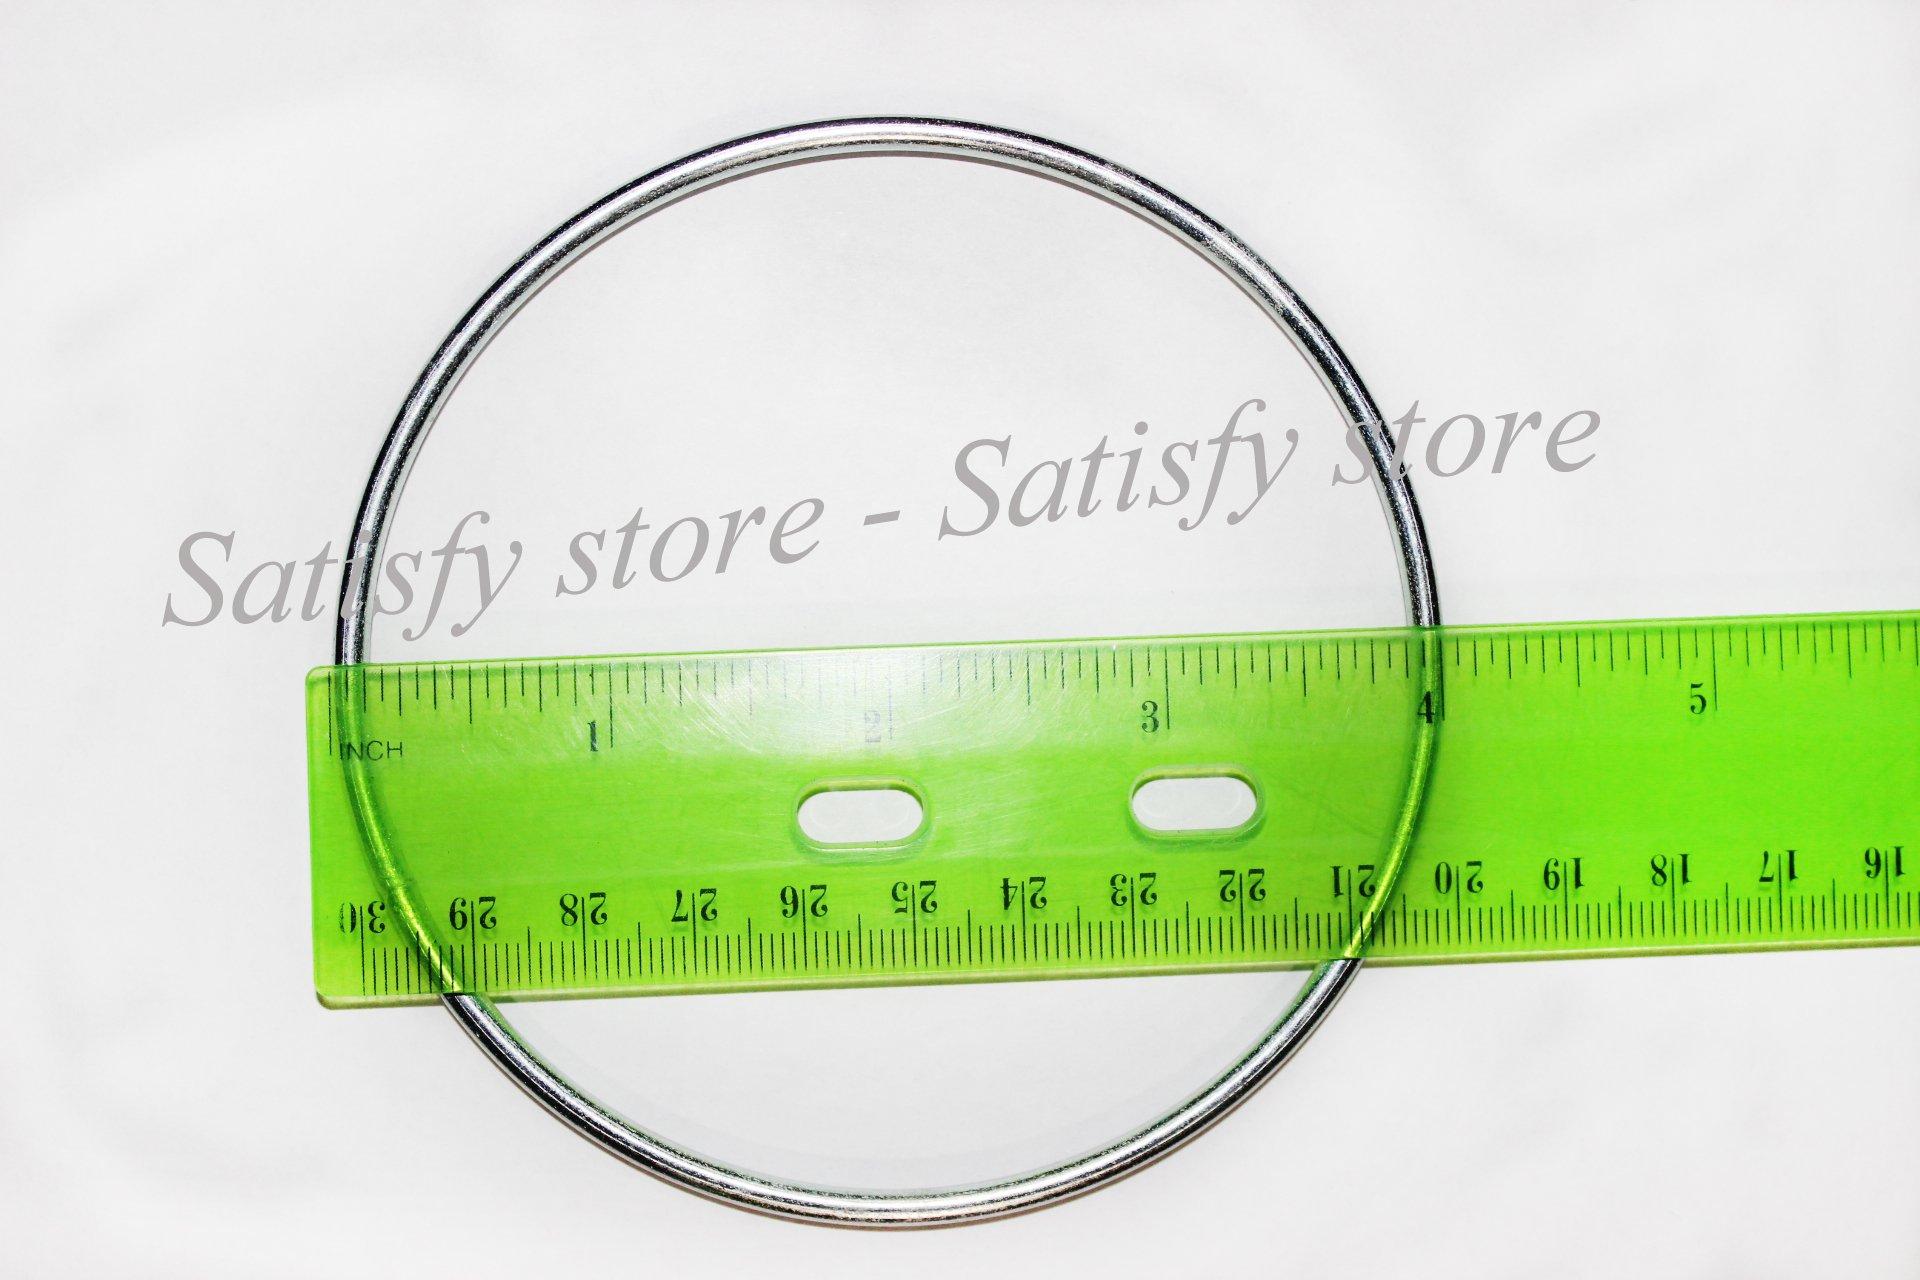 Bistore - Set of 10pcs Dream Catcher metal hoops (Dream Catcher metal rings) (4-inch, Silver)